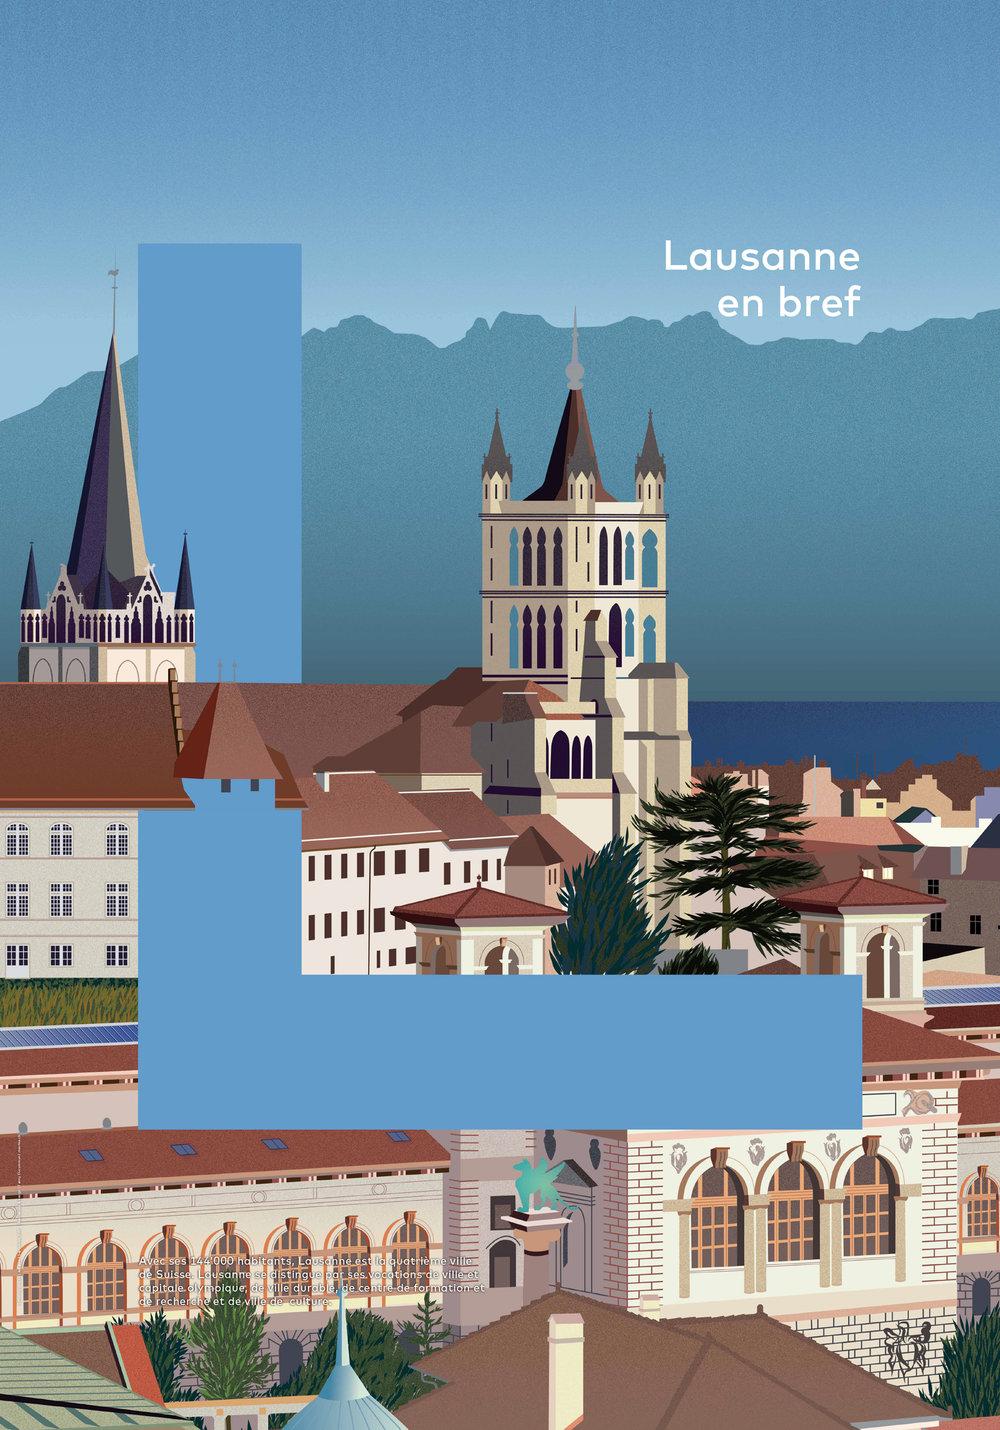 Mashka_VilledeLausanne_Lausanne-Marseille_site.jpg